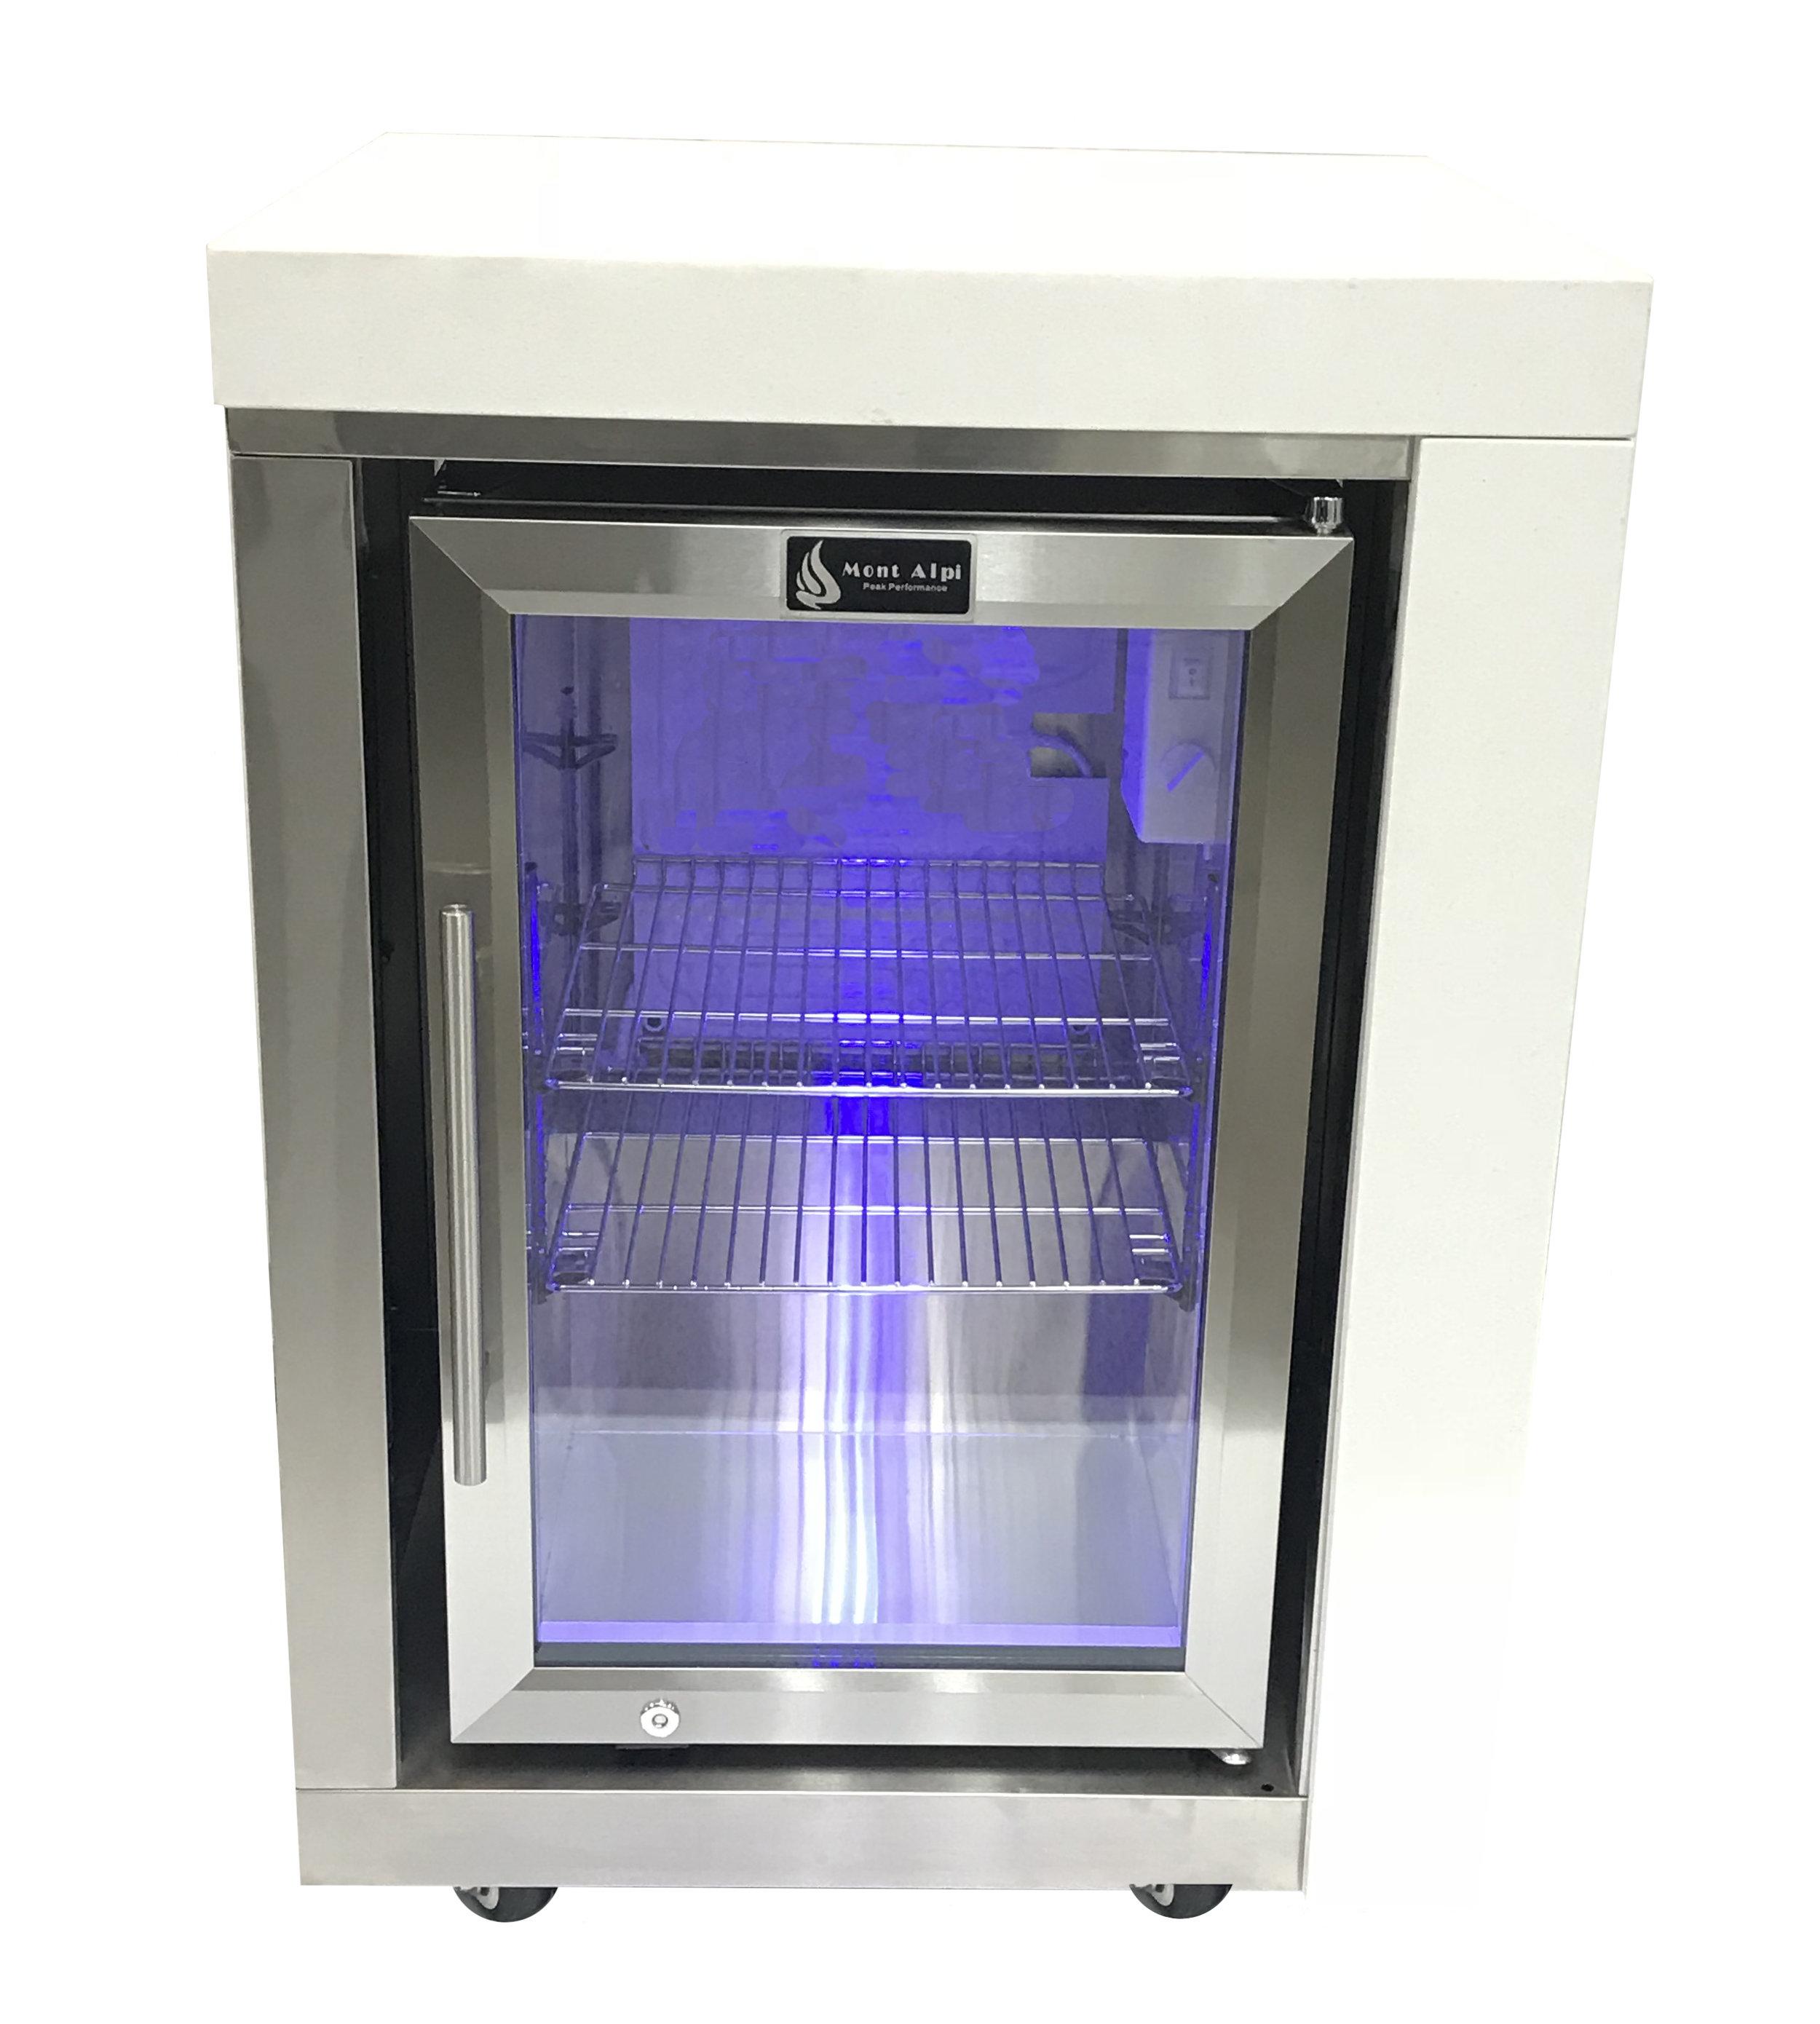 fridge front jpeg.jpg